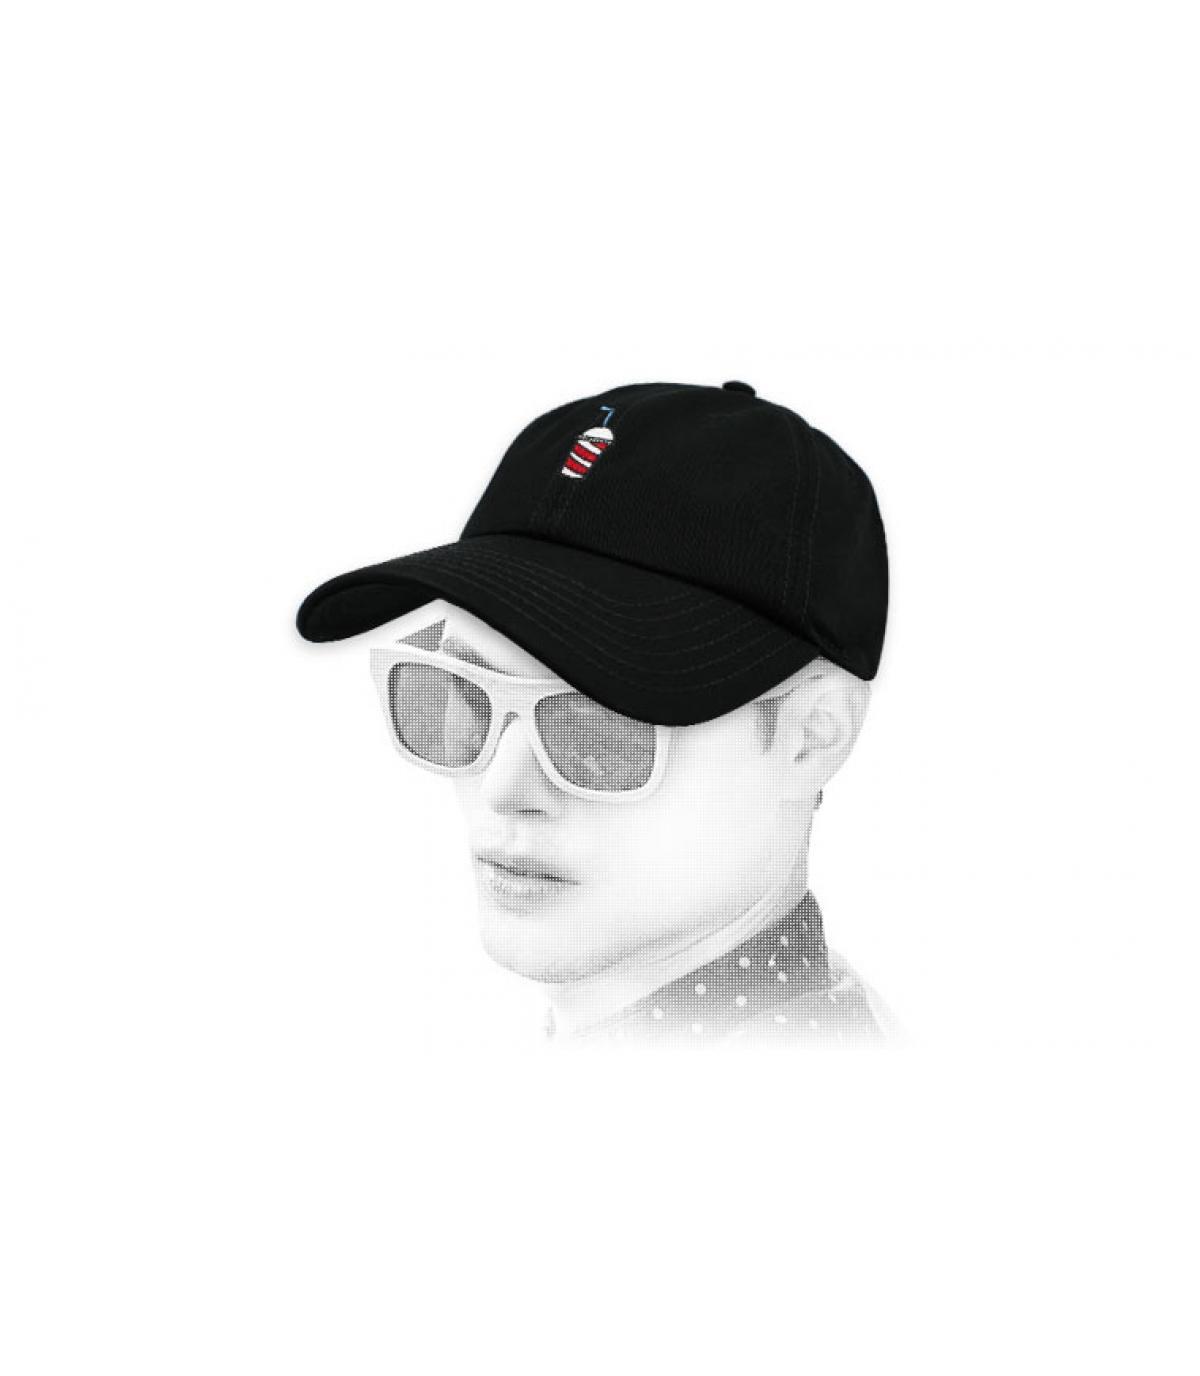 gorra batido negro Wemoto